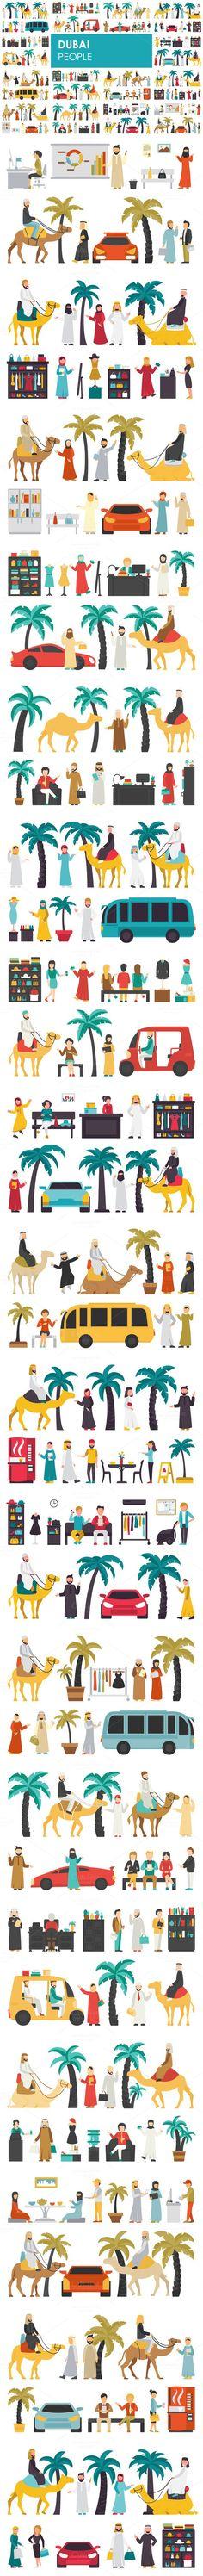 Dubai - flat people set. Graphic Design Infographics. $7.00